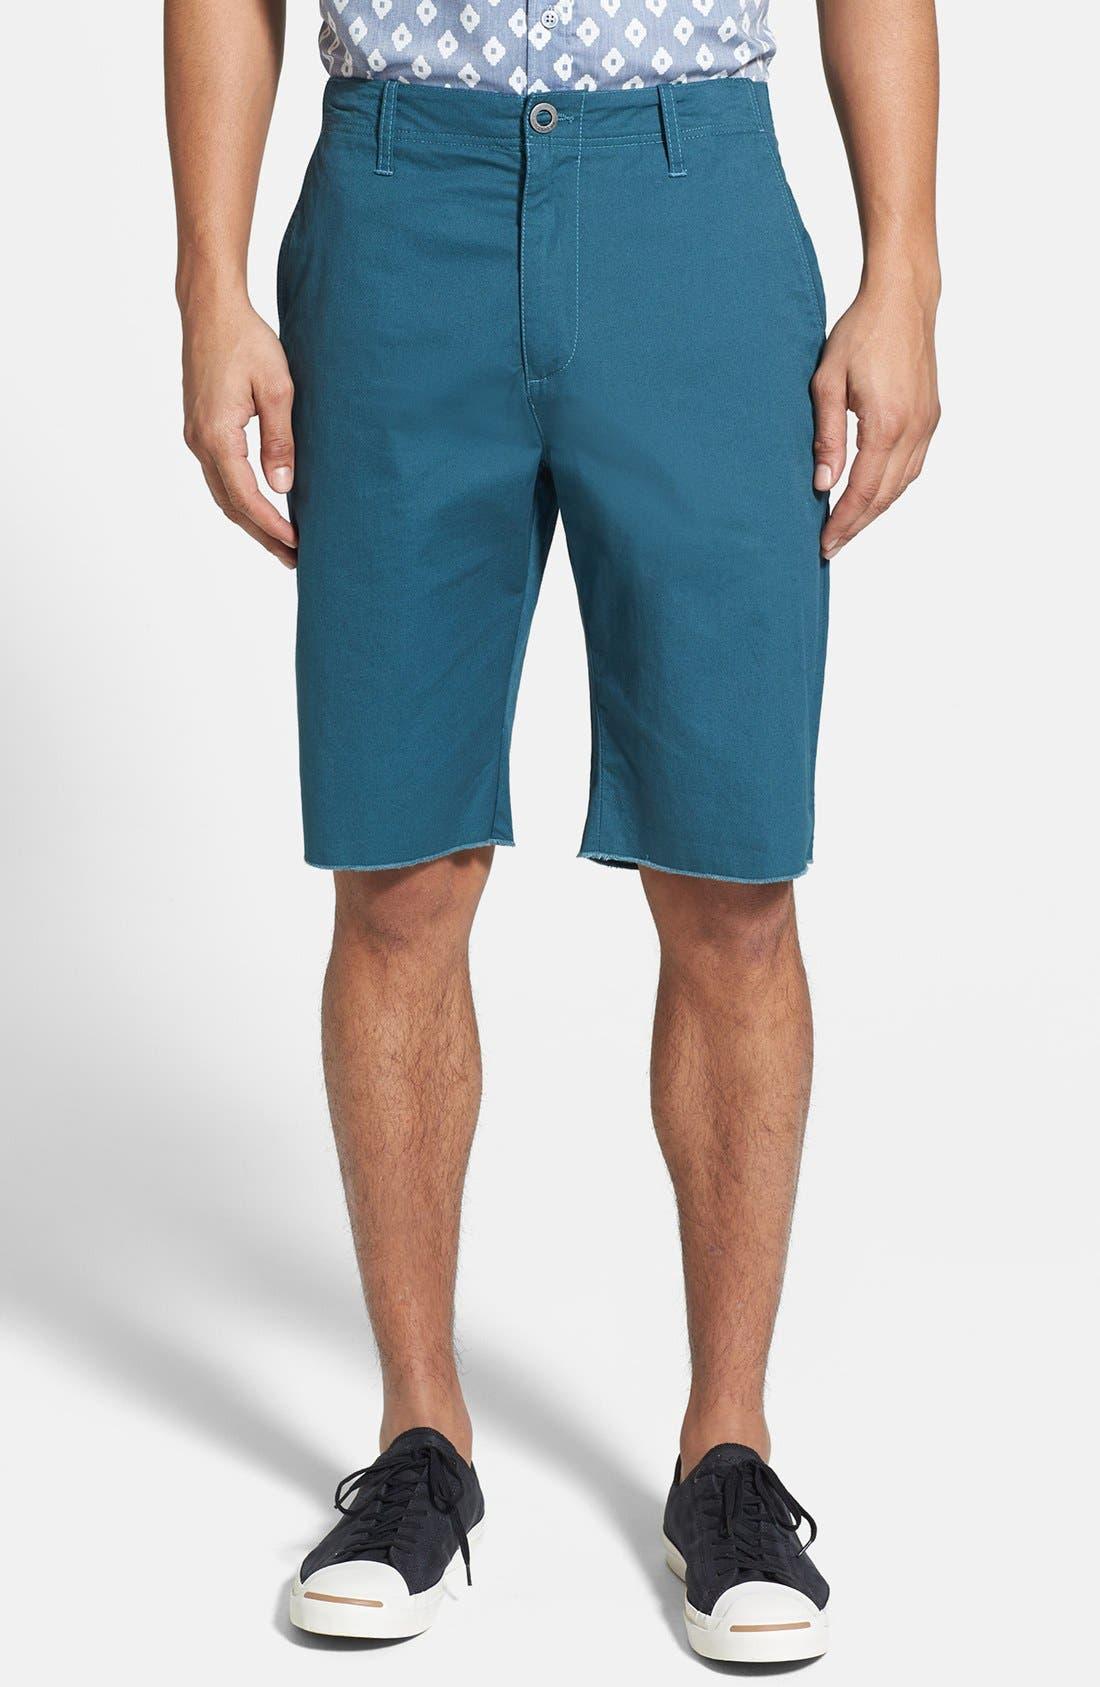 Alternate Image 1 Selected - Volcom 'Stonewater' Shorts